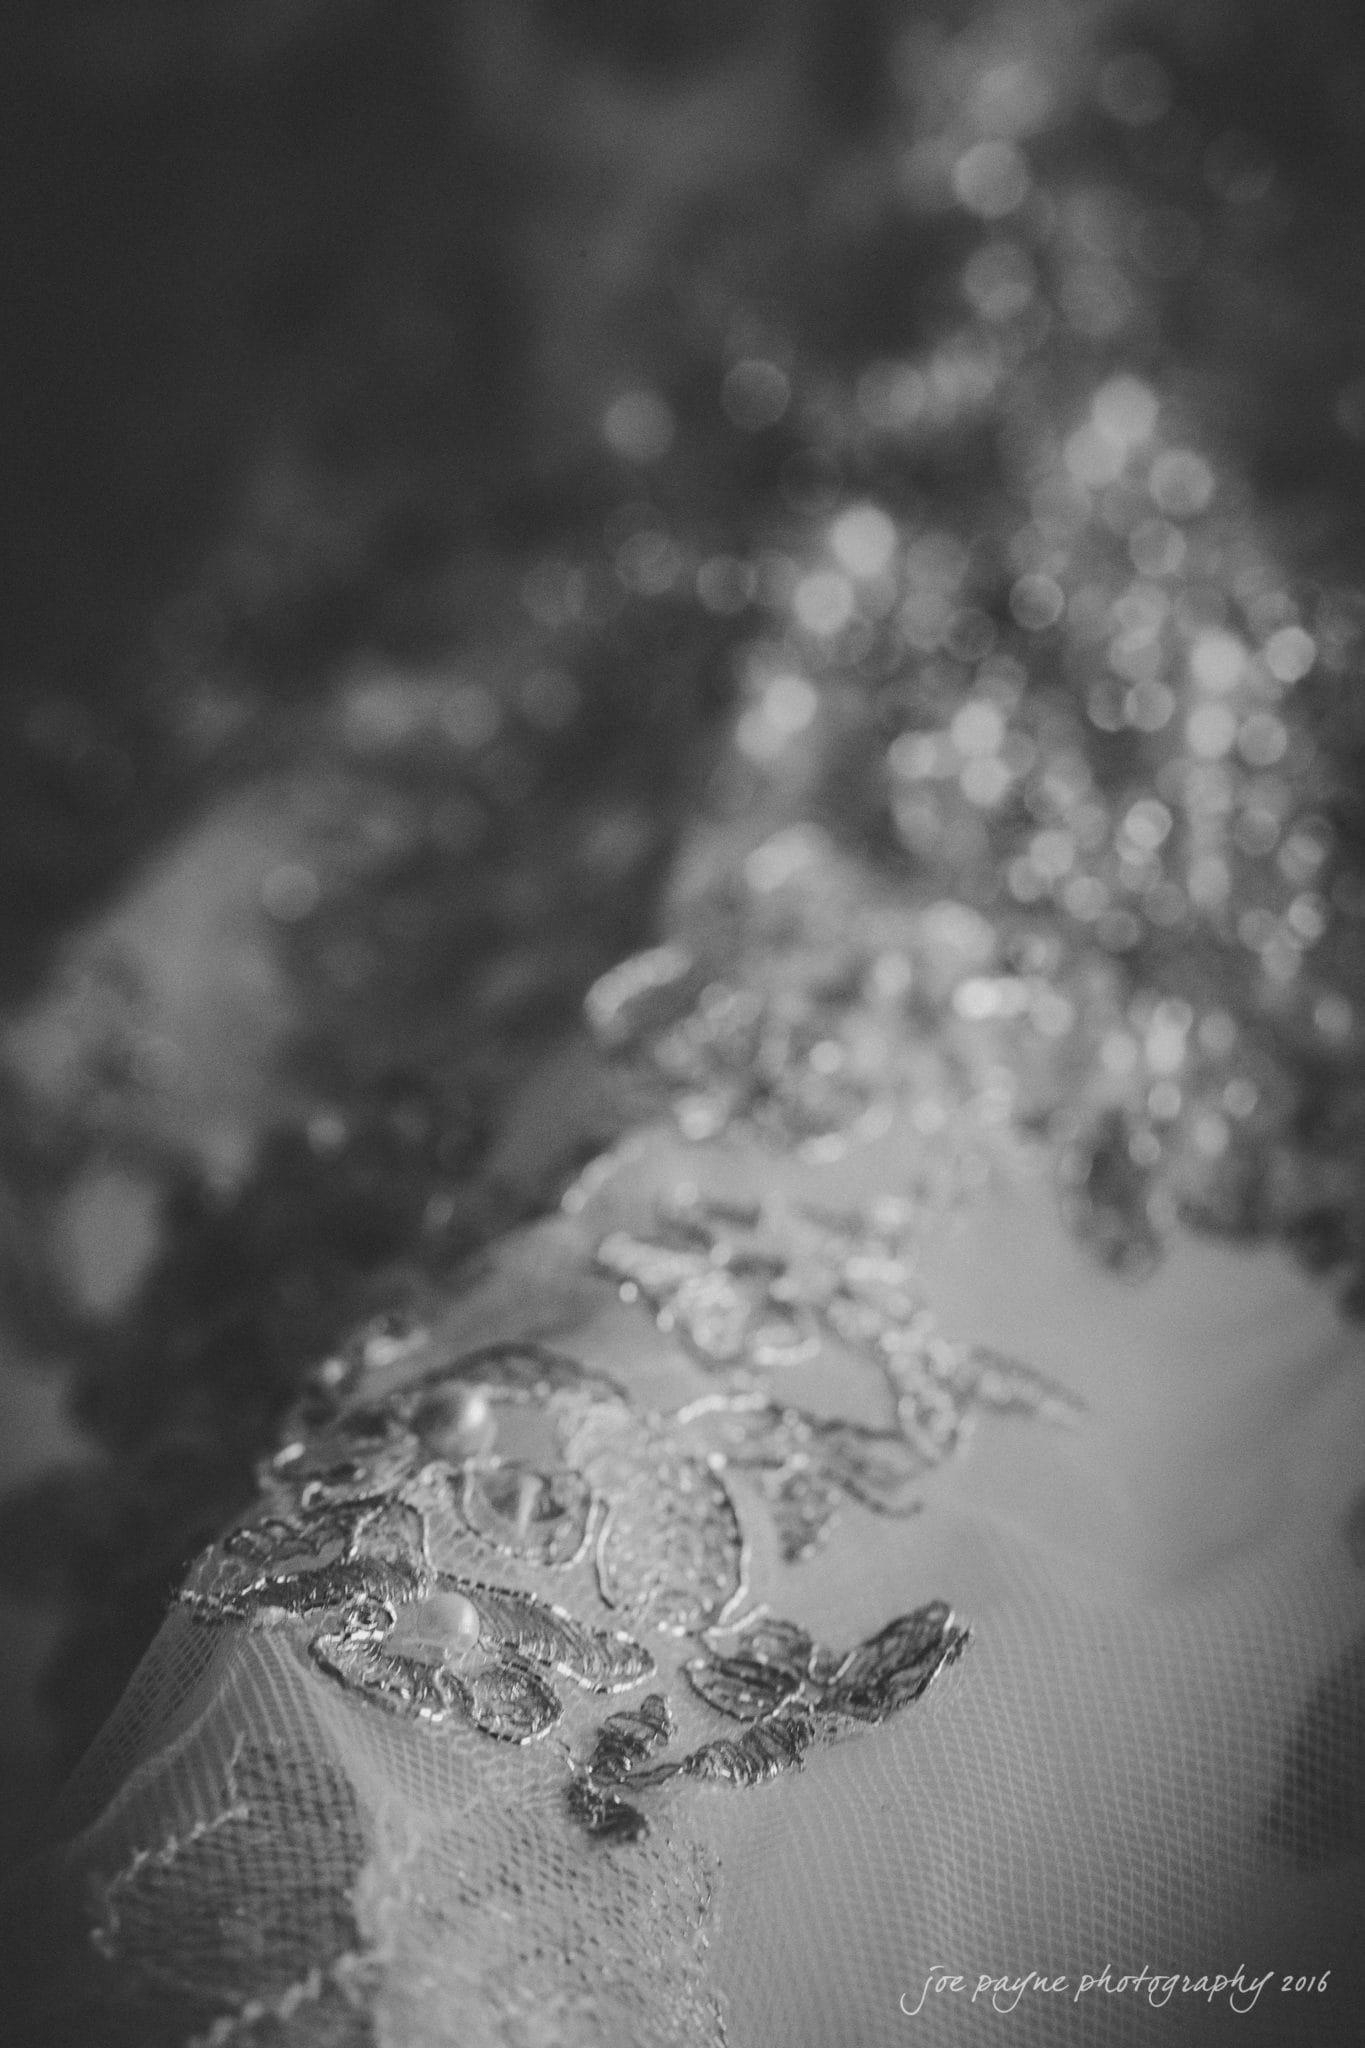 first-baptist-millennium-center-winston-salem-wedding-photography-toni-kevin-1